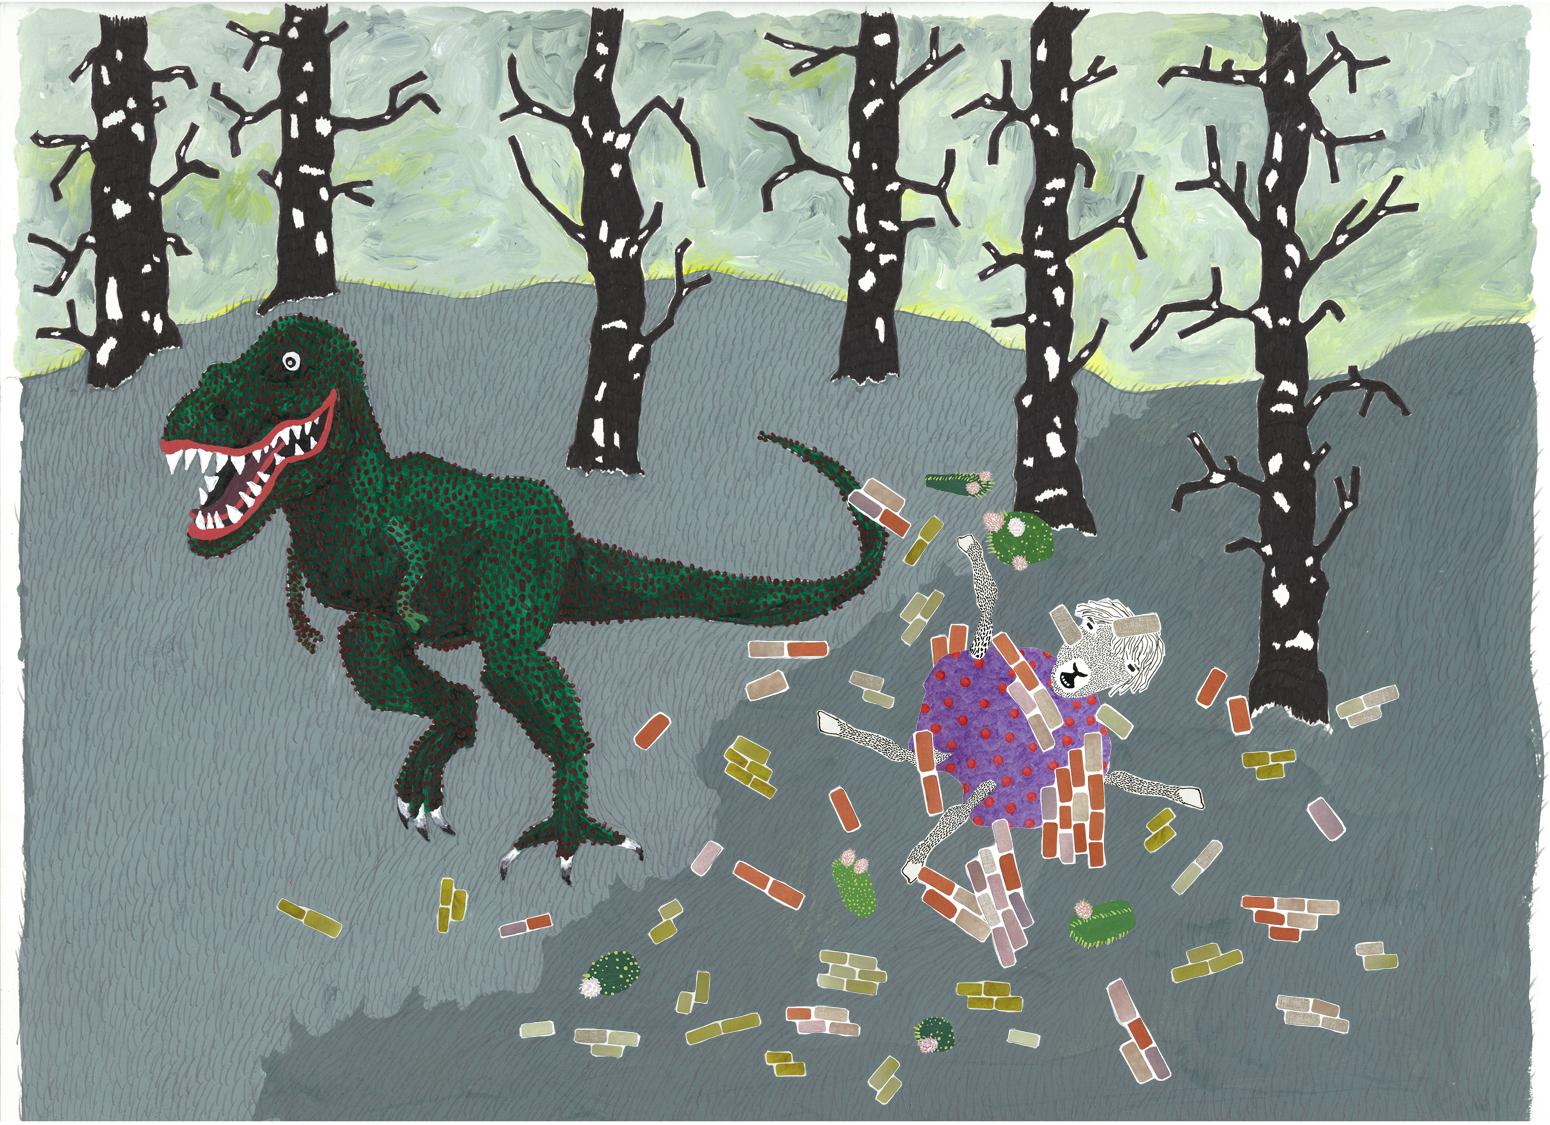 dinosaur knocks down wall unintentionally